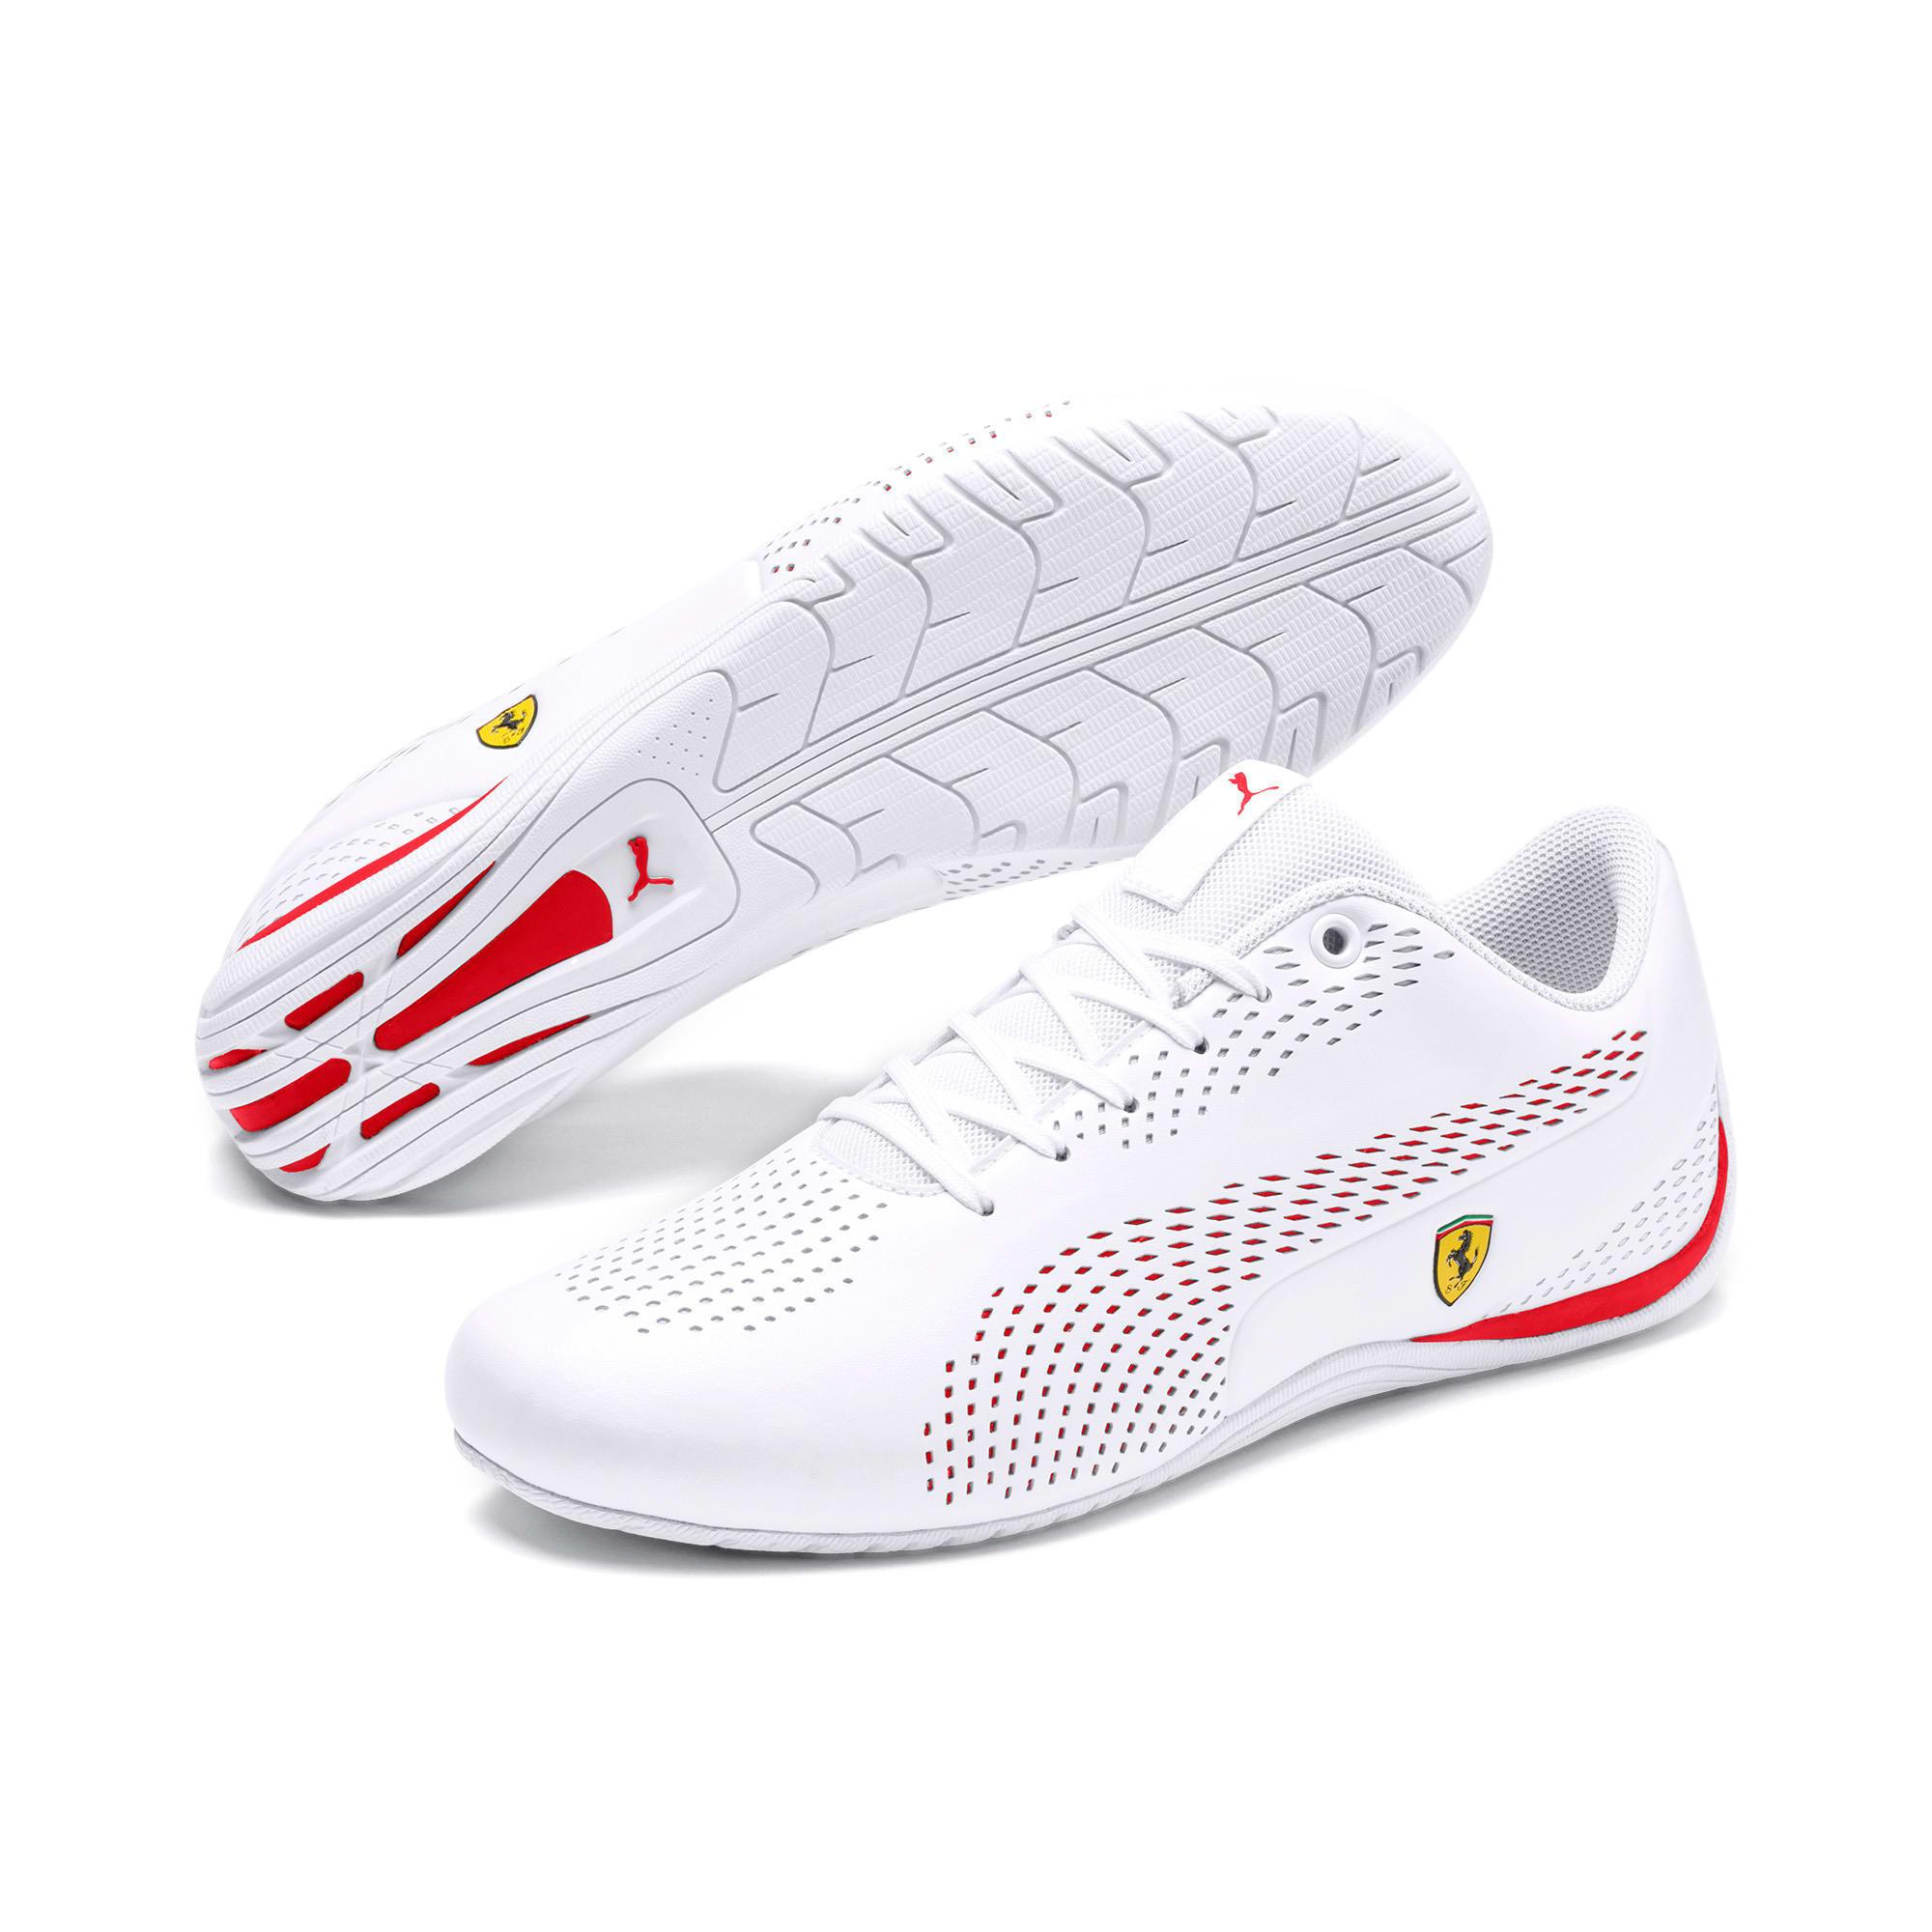 Thumbnail 3 of Ferrari Drift Cat 5 Ultra II Trainers, Puma White-Rosso Corsa, medium-IND